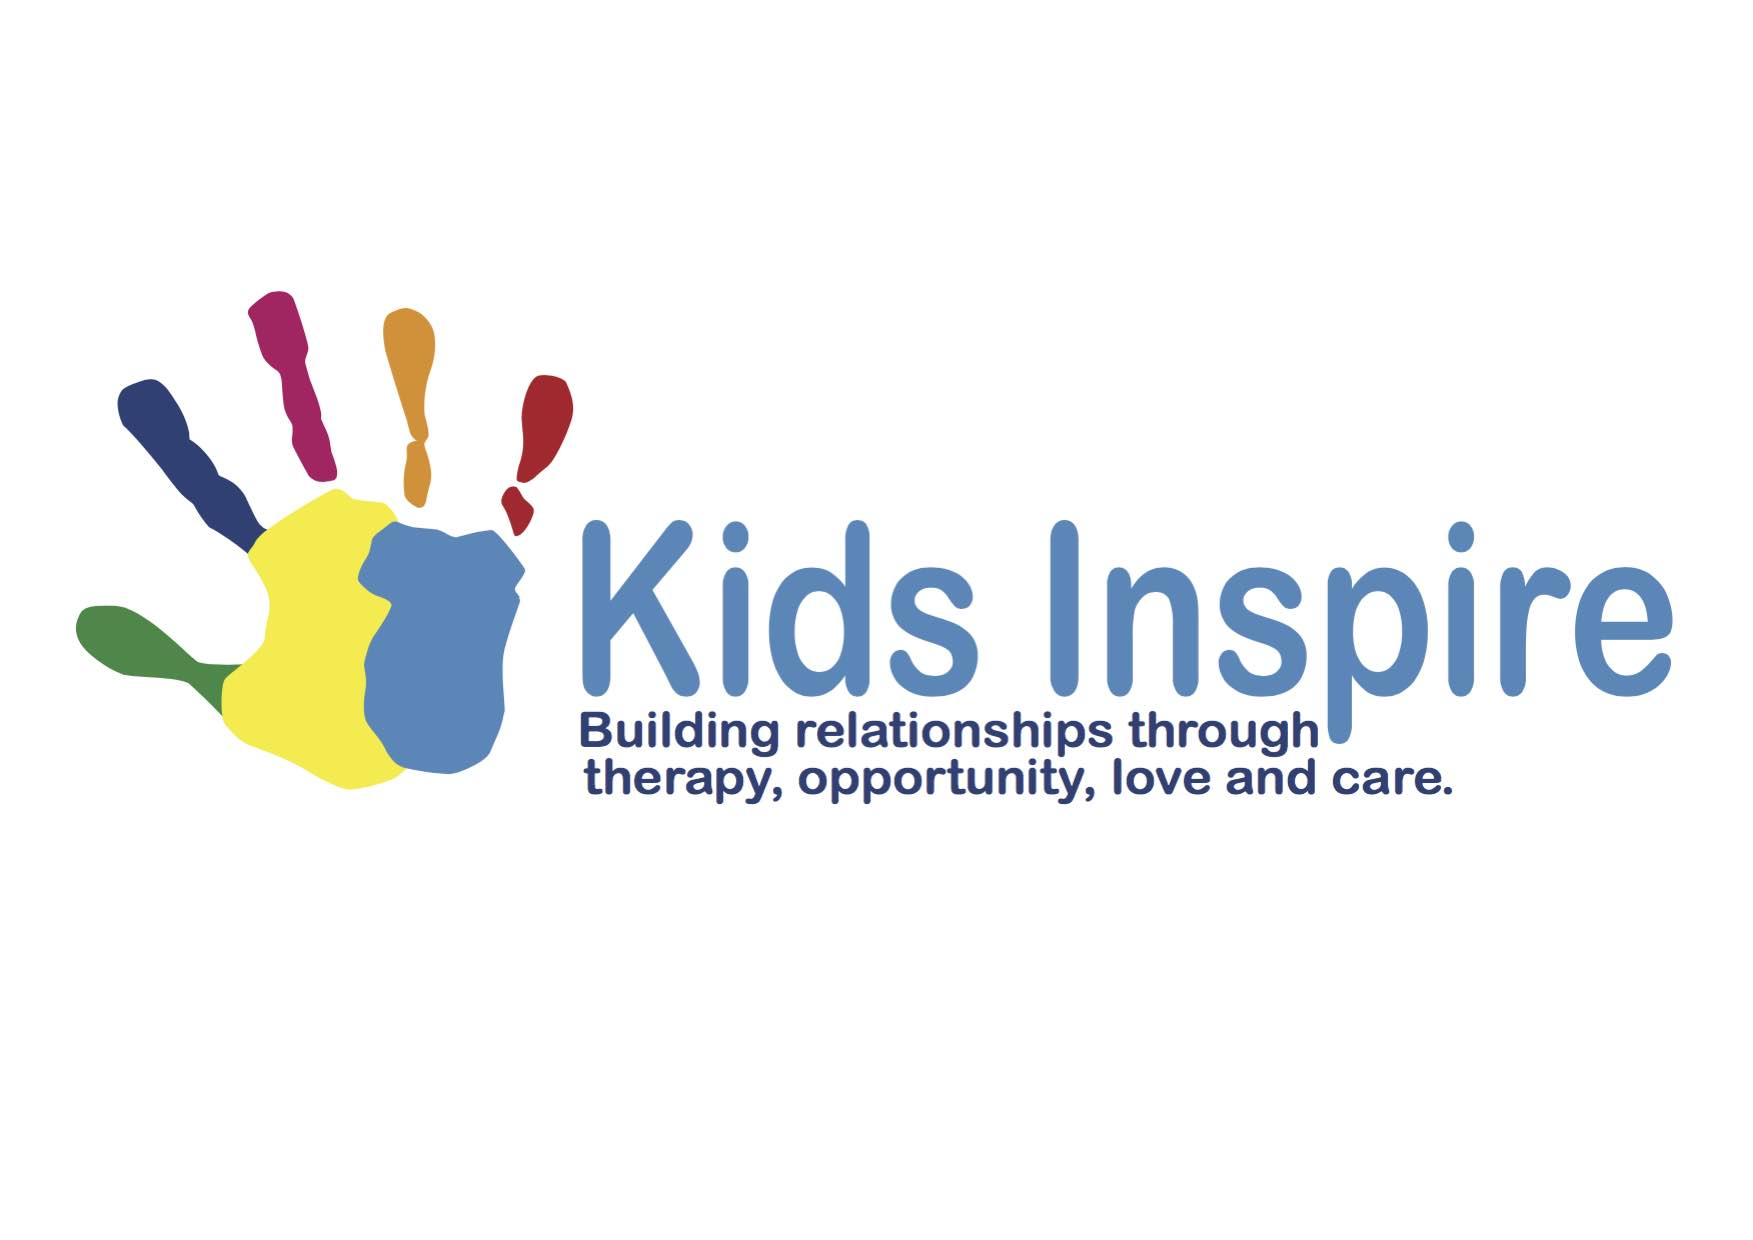 Kids Inspire